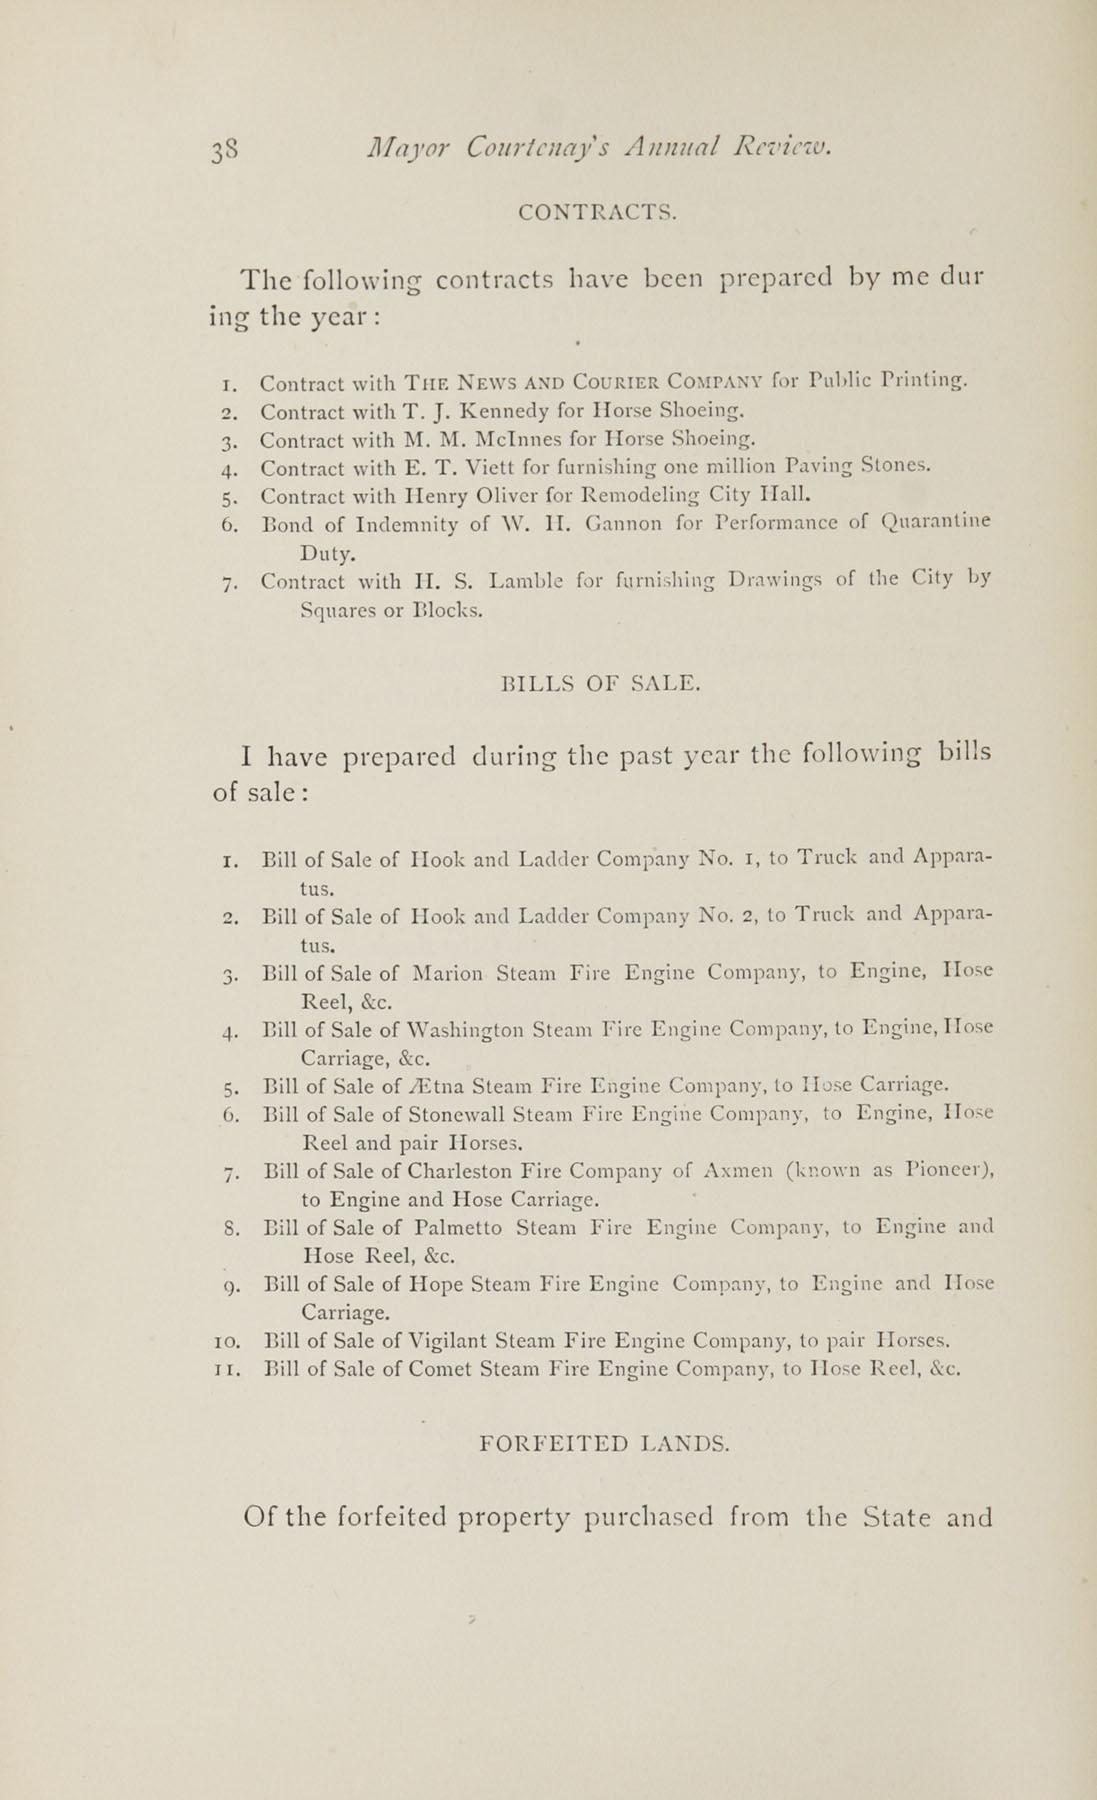 Charleston Yearbook, 1882, page 38